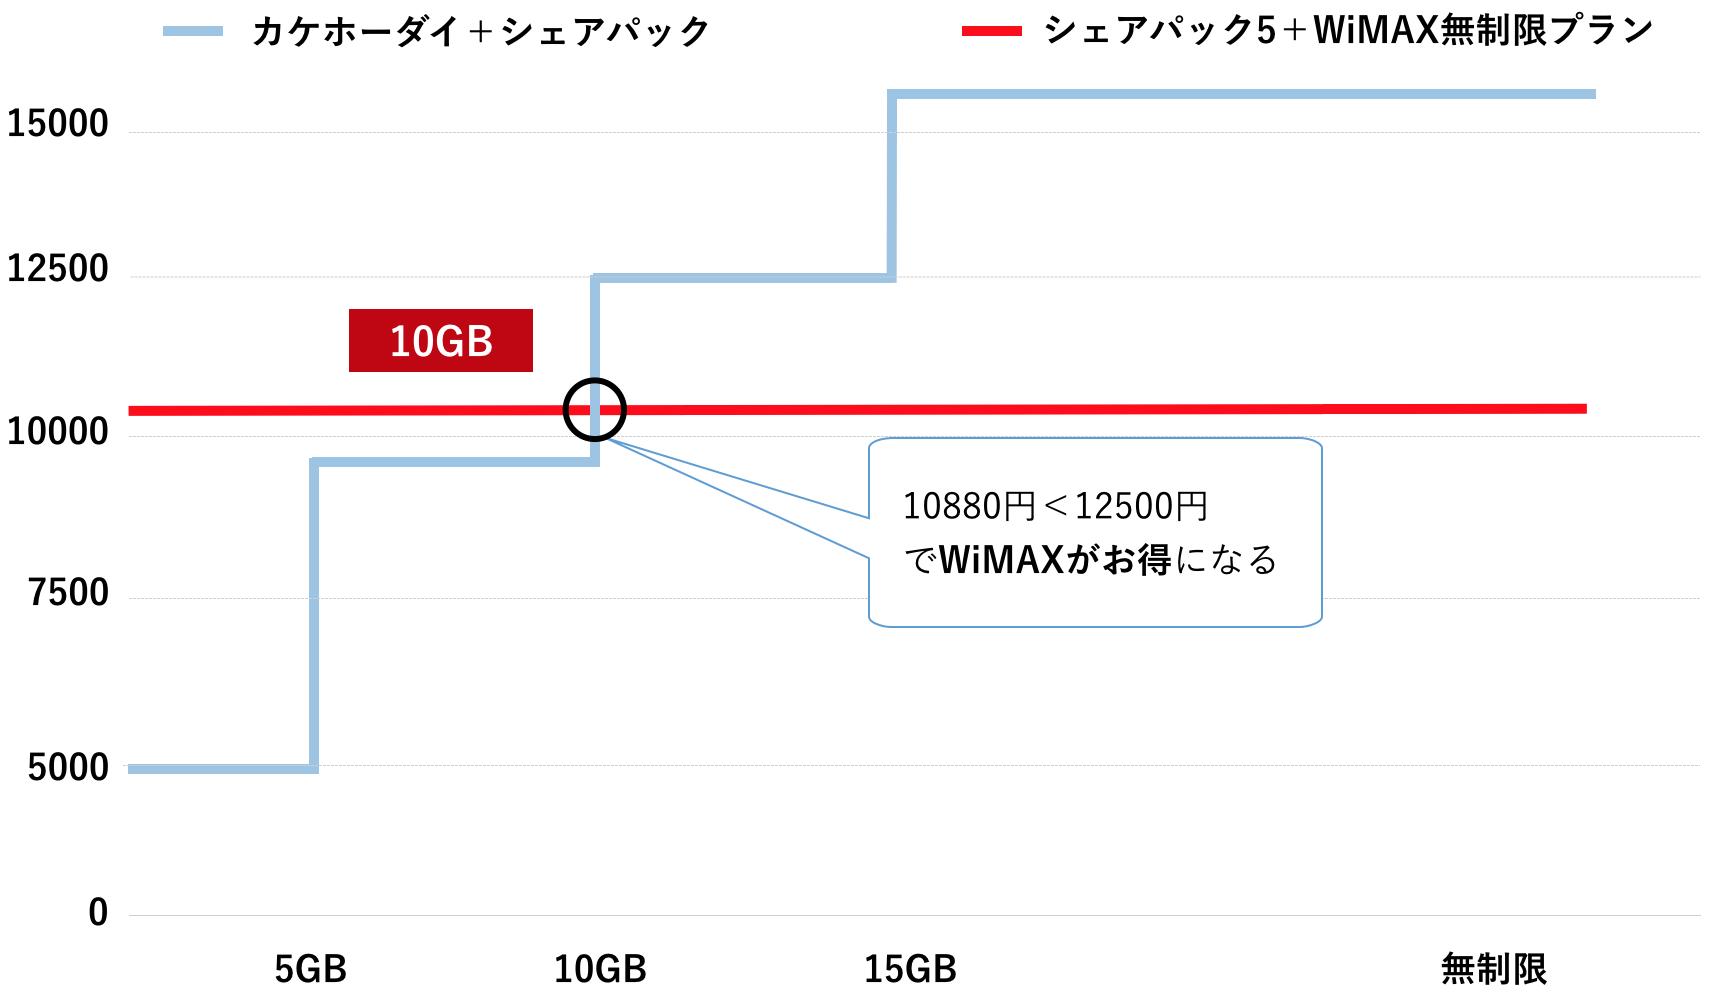 WiMAX スマホ docomo 家族